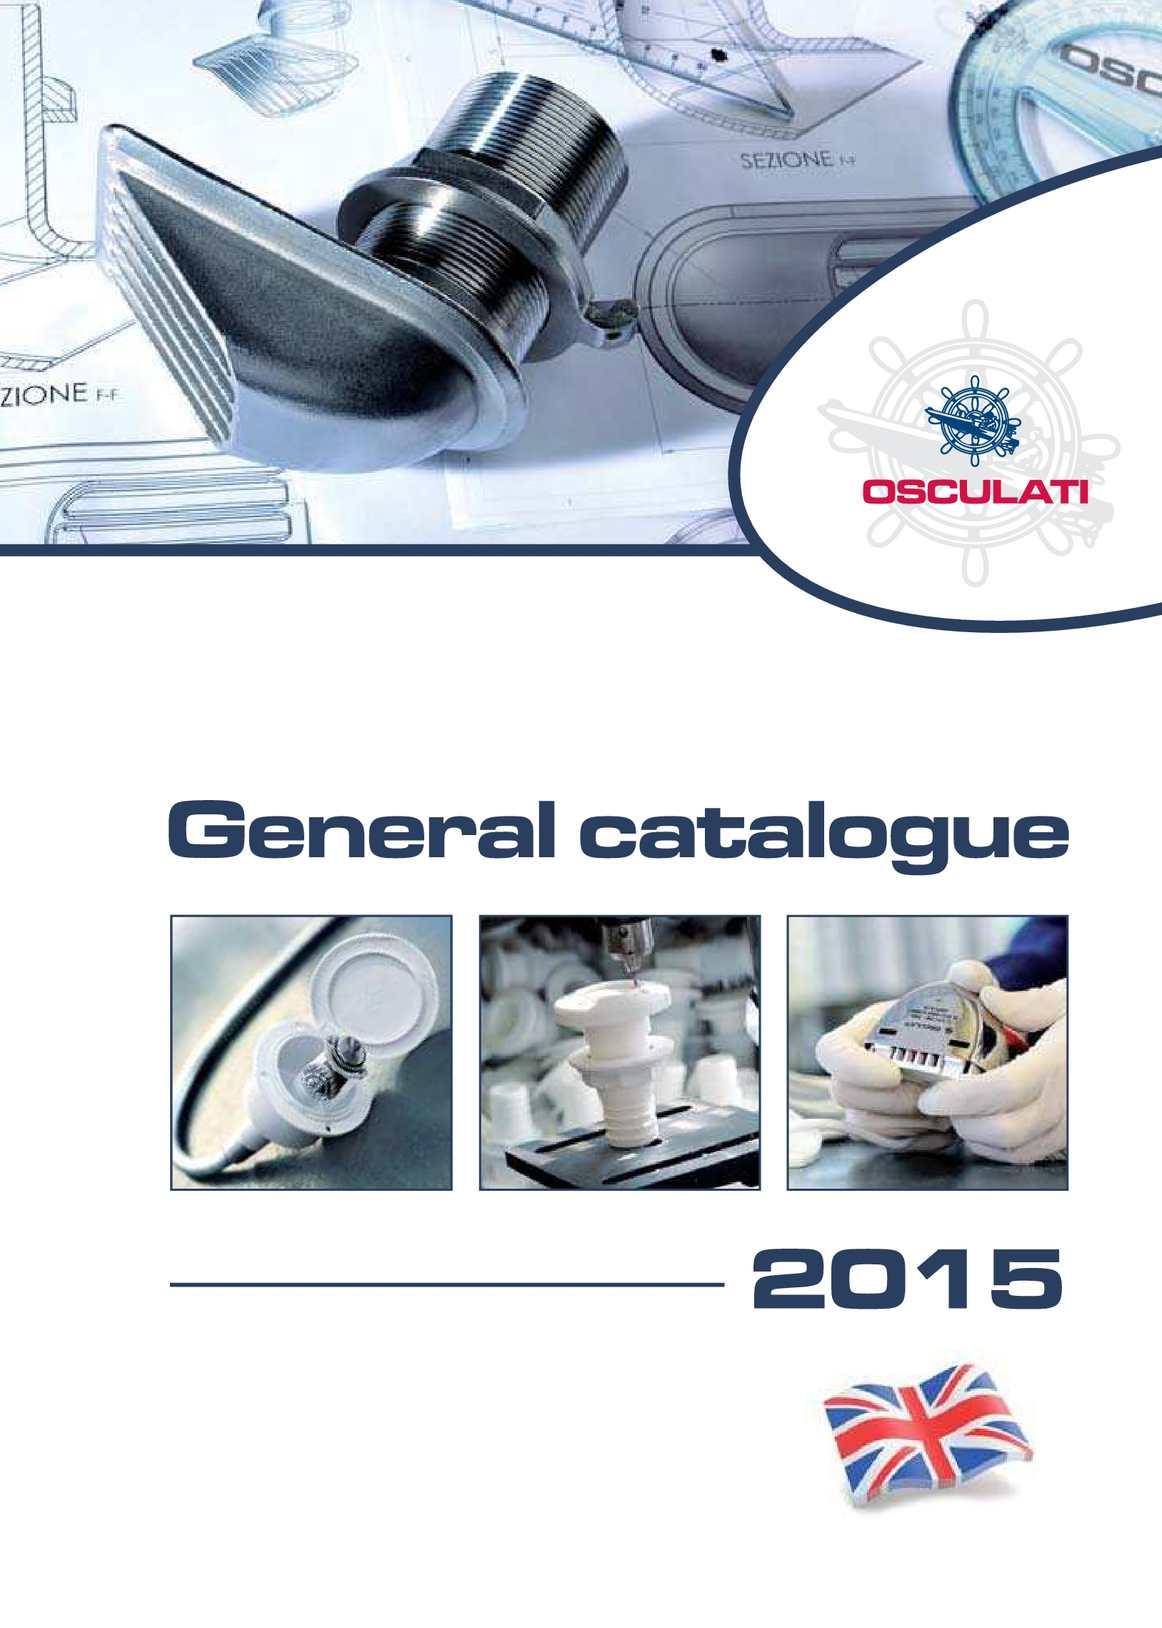 Calamo Osculati General Cat 2015 Eng 1 2 Suoer In Inverter Charger 500 Watt Typer Saa 500w C